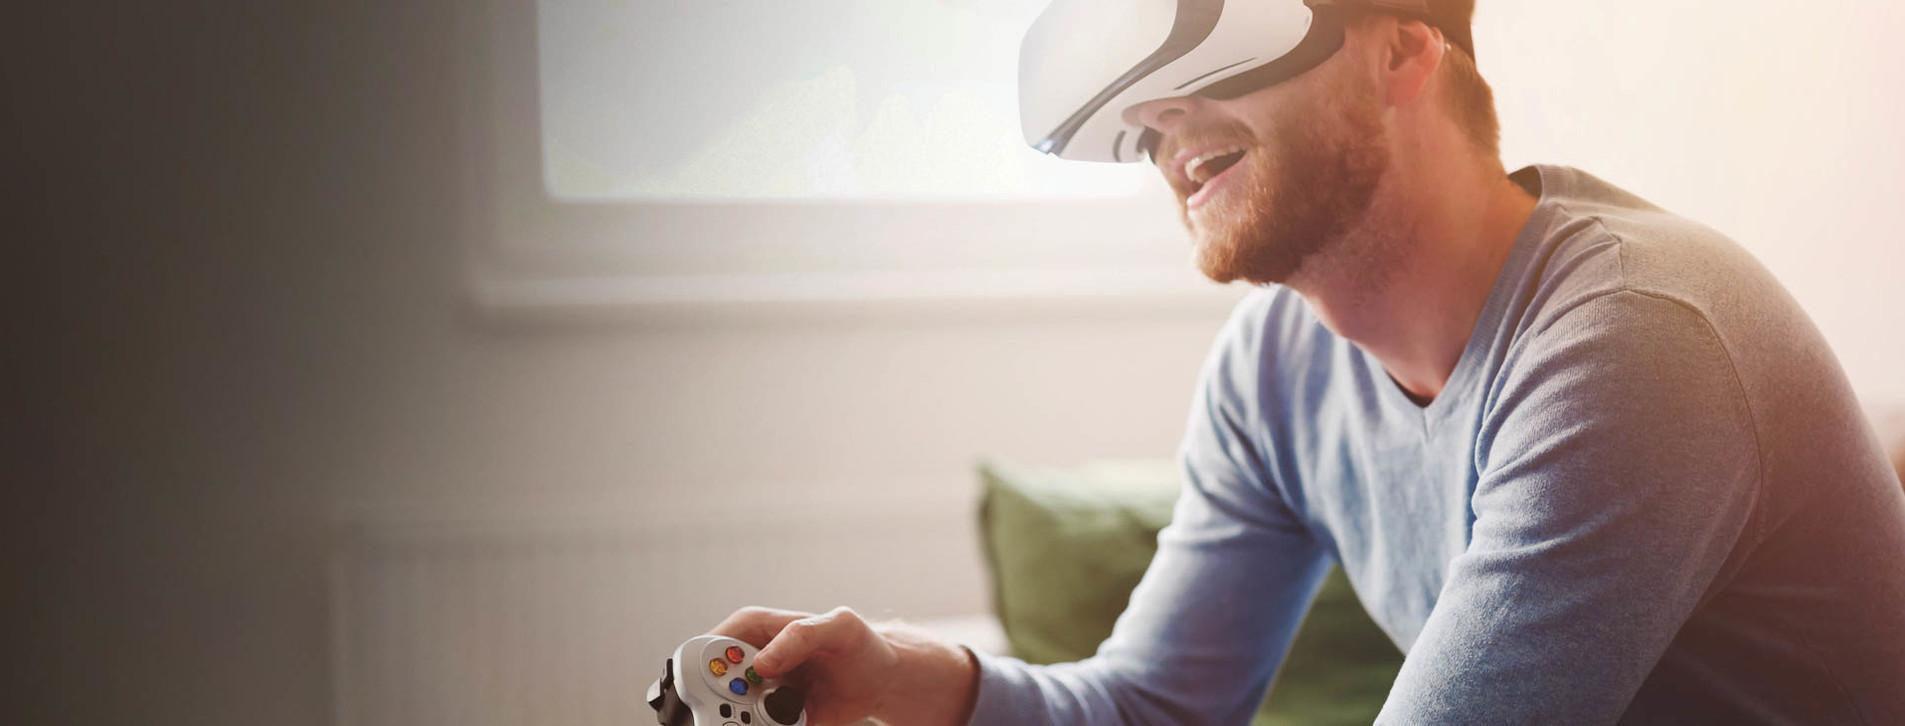 Фото - Playstation у VR-окулярах